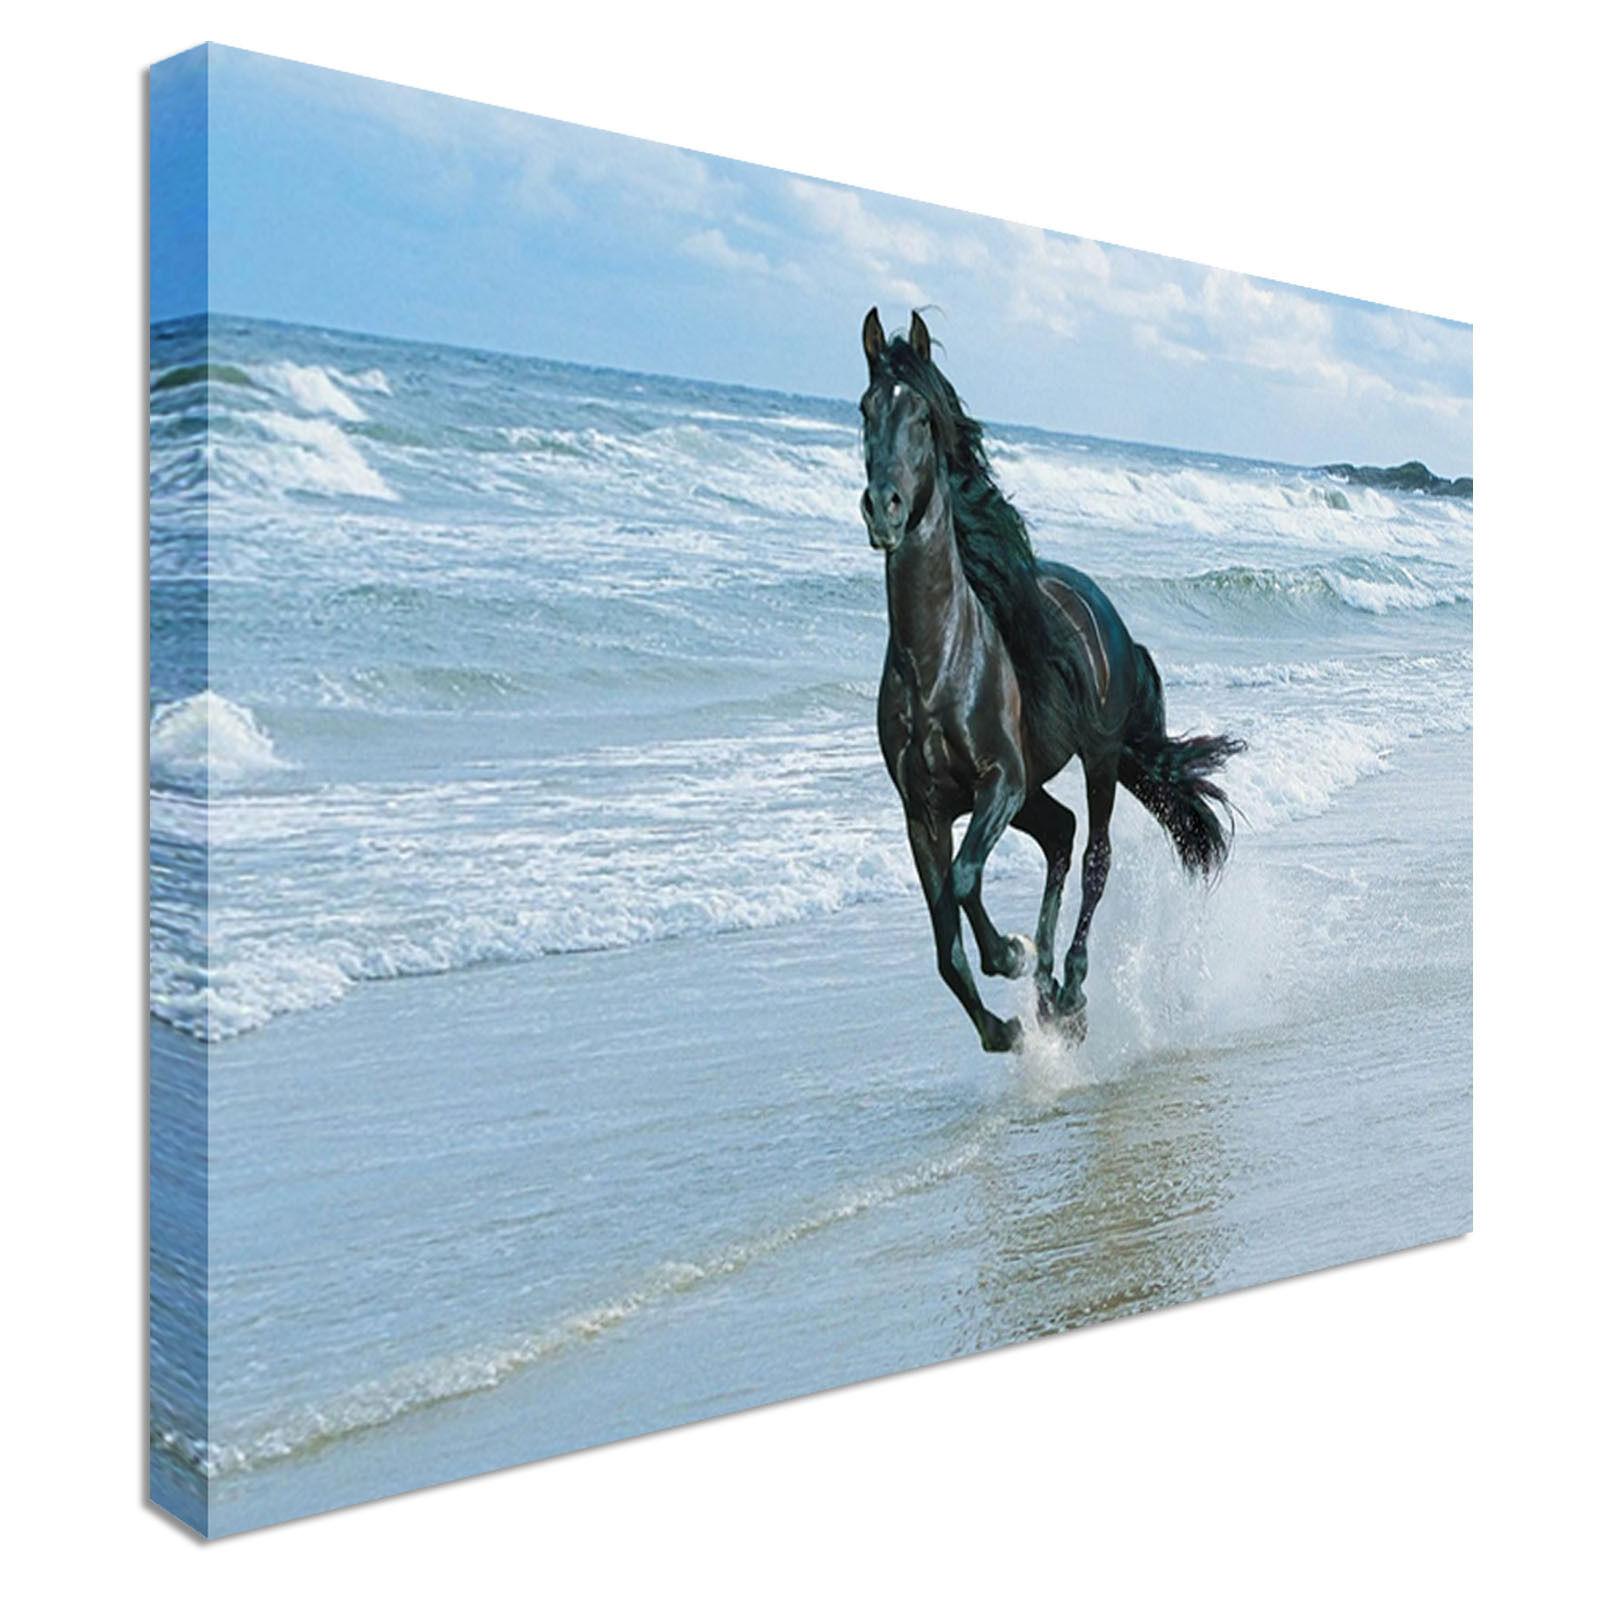 GRANDE tela Cavallo galoppante galoppante galoppante Wall Art Print GRANDI + qualunque dimensione b3b599